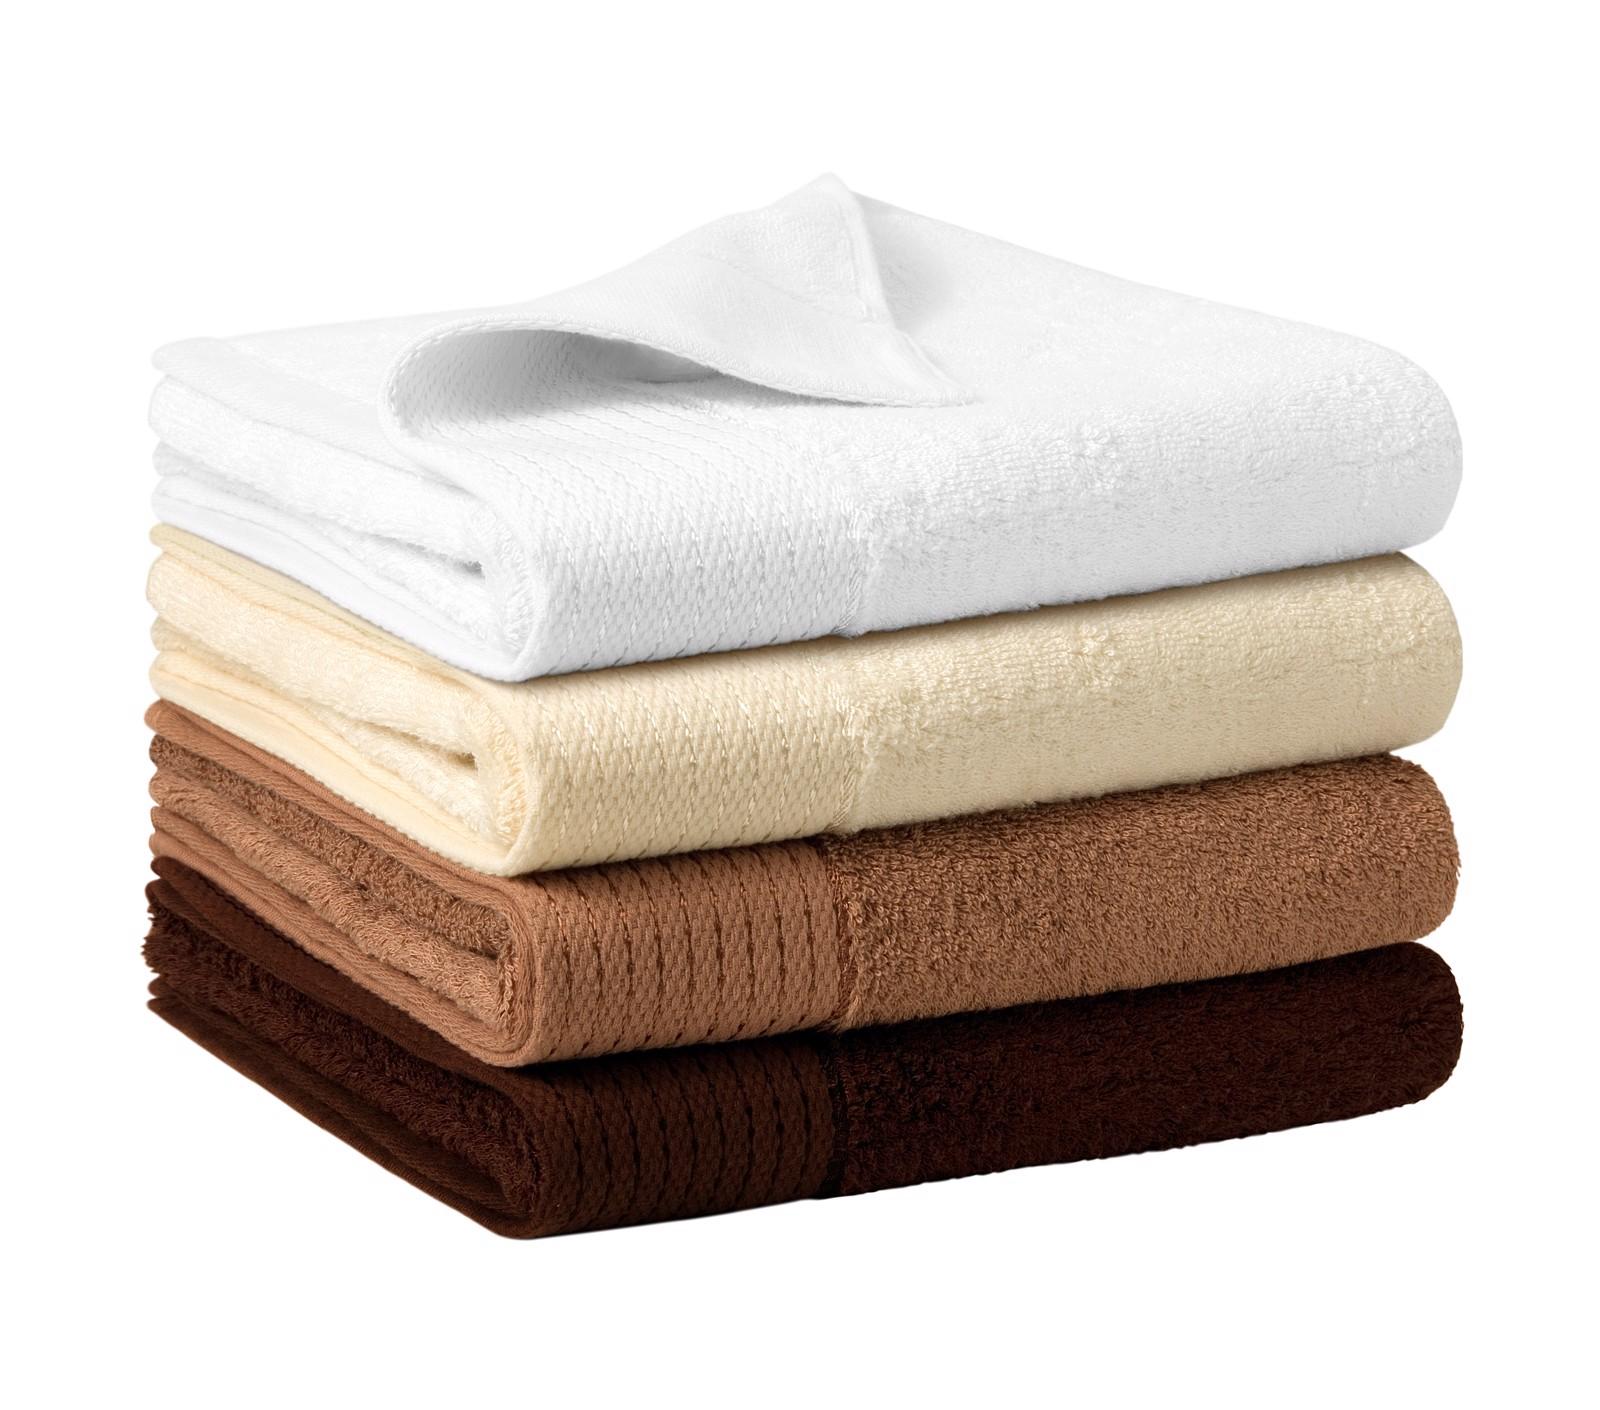 Towel unisex Malfinipremium Bamboo Towel - White / 50 x 100 cm